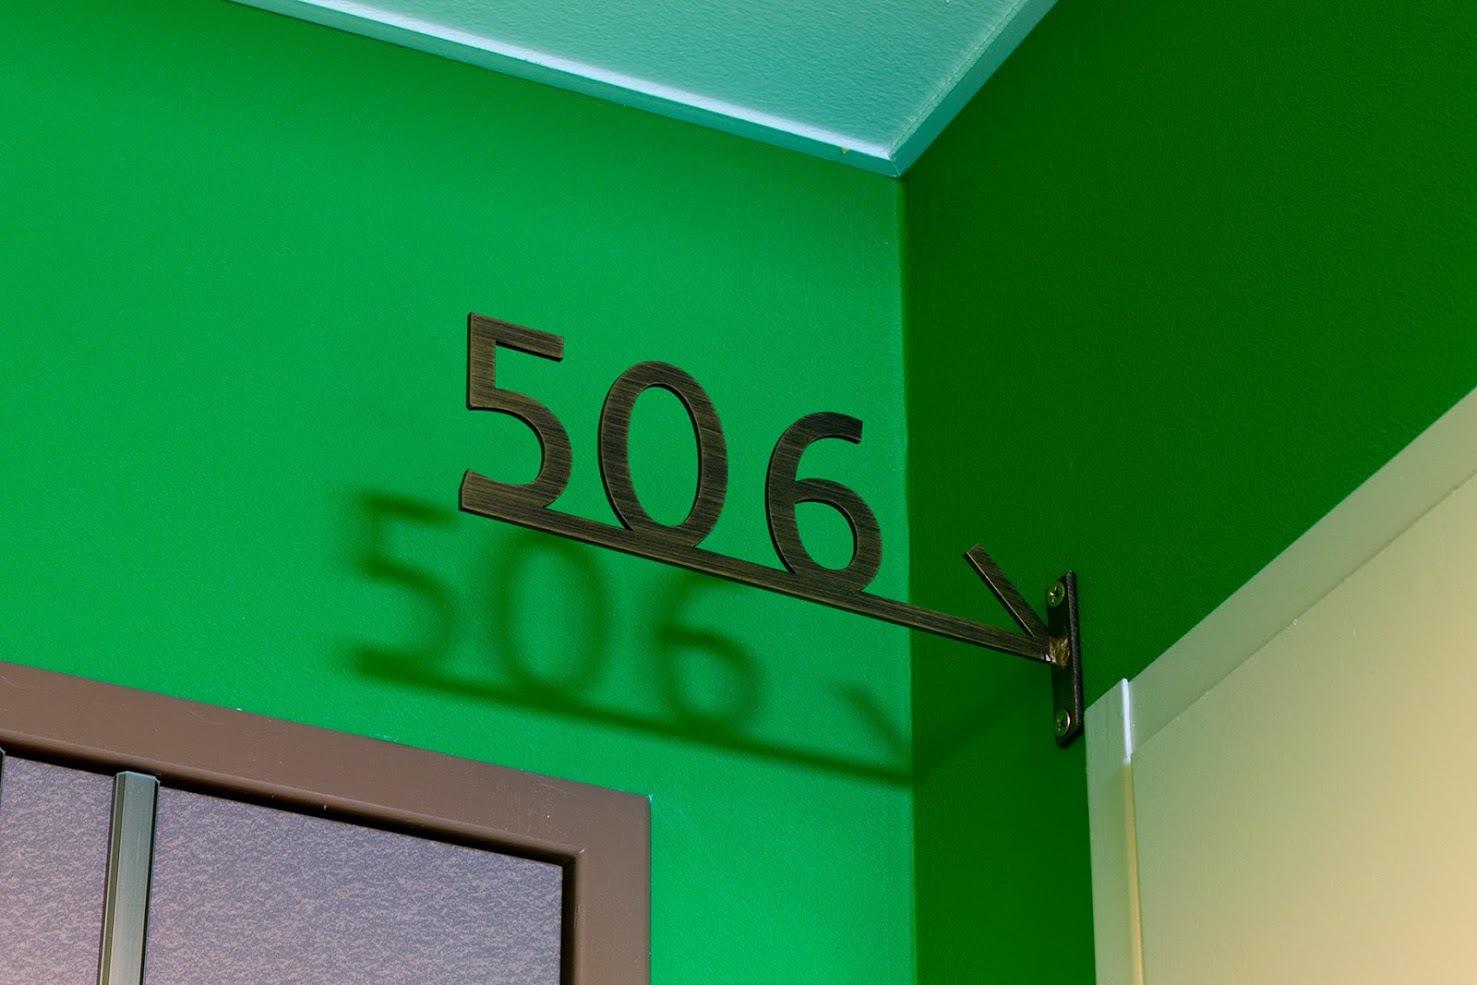 506-1